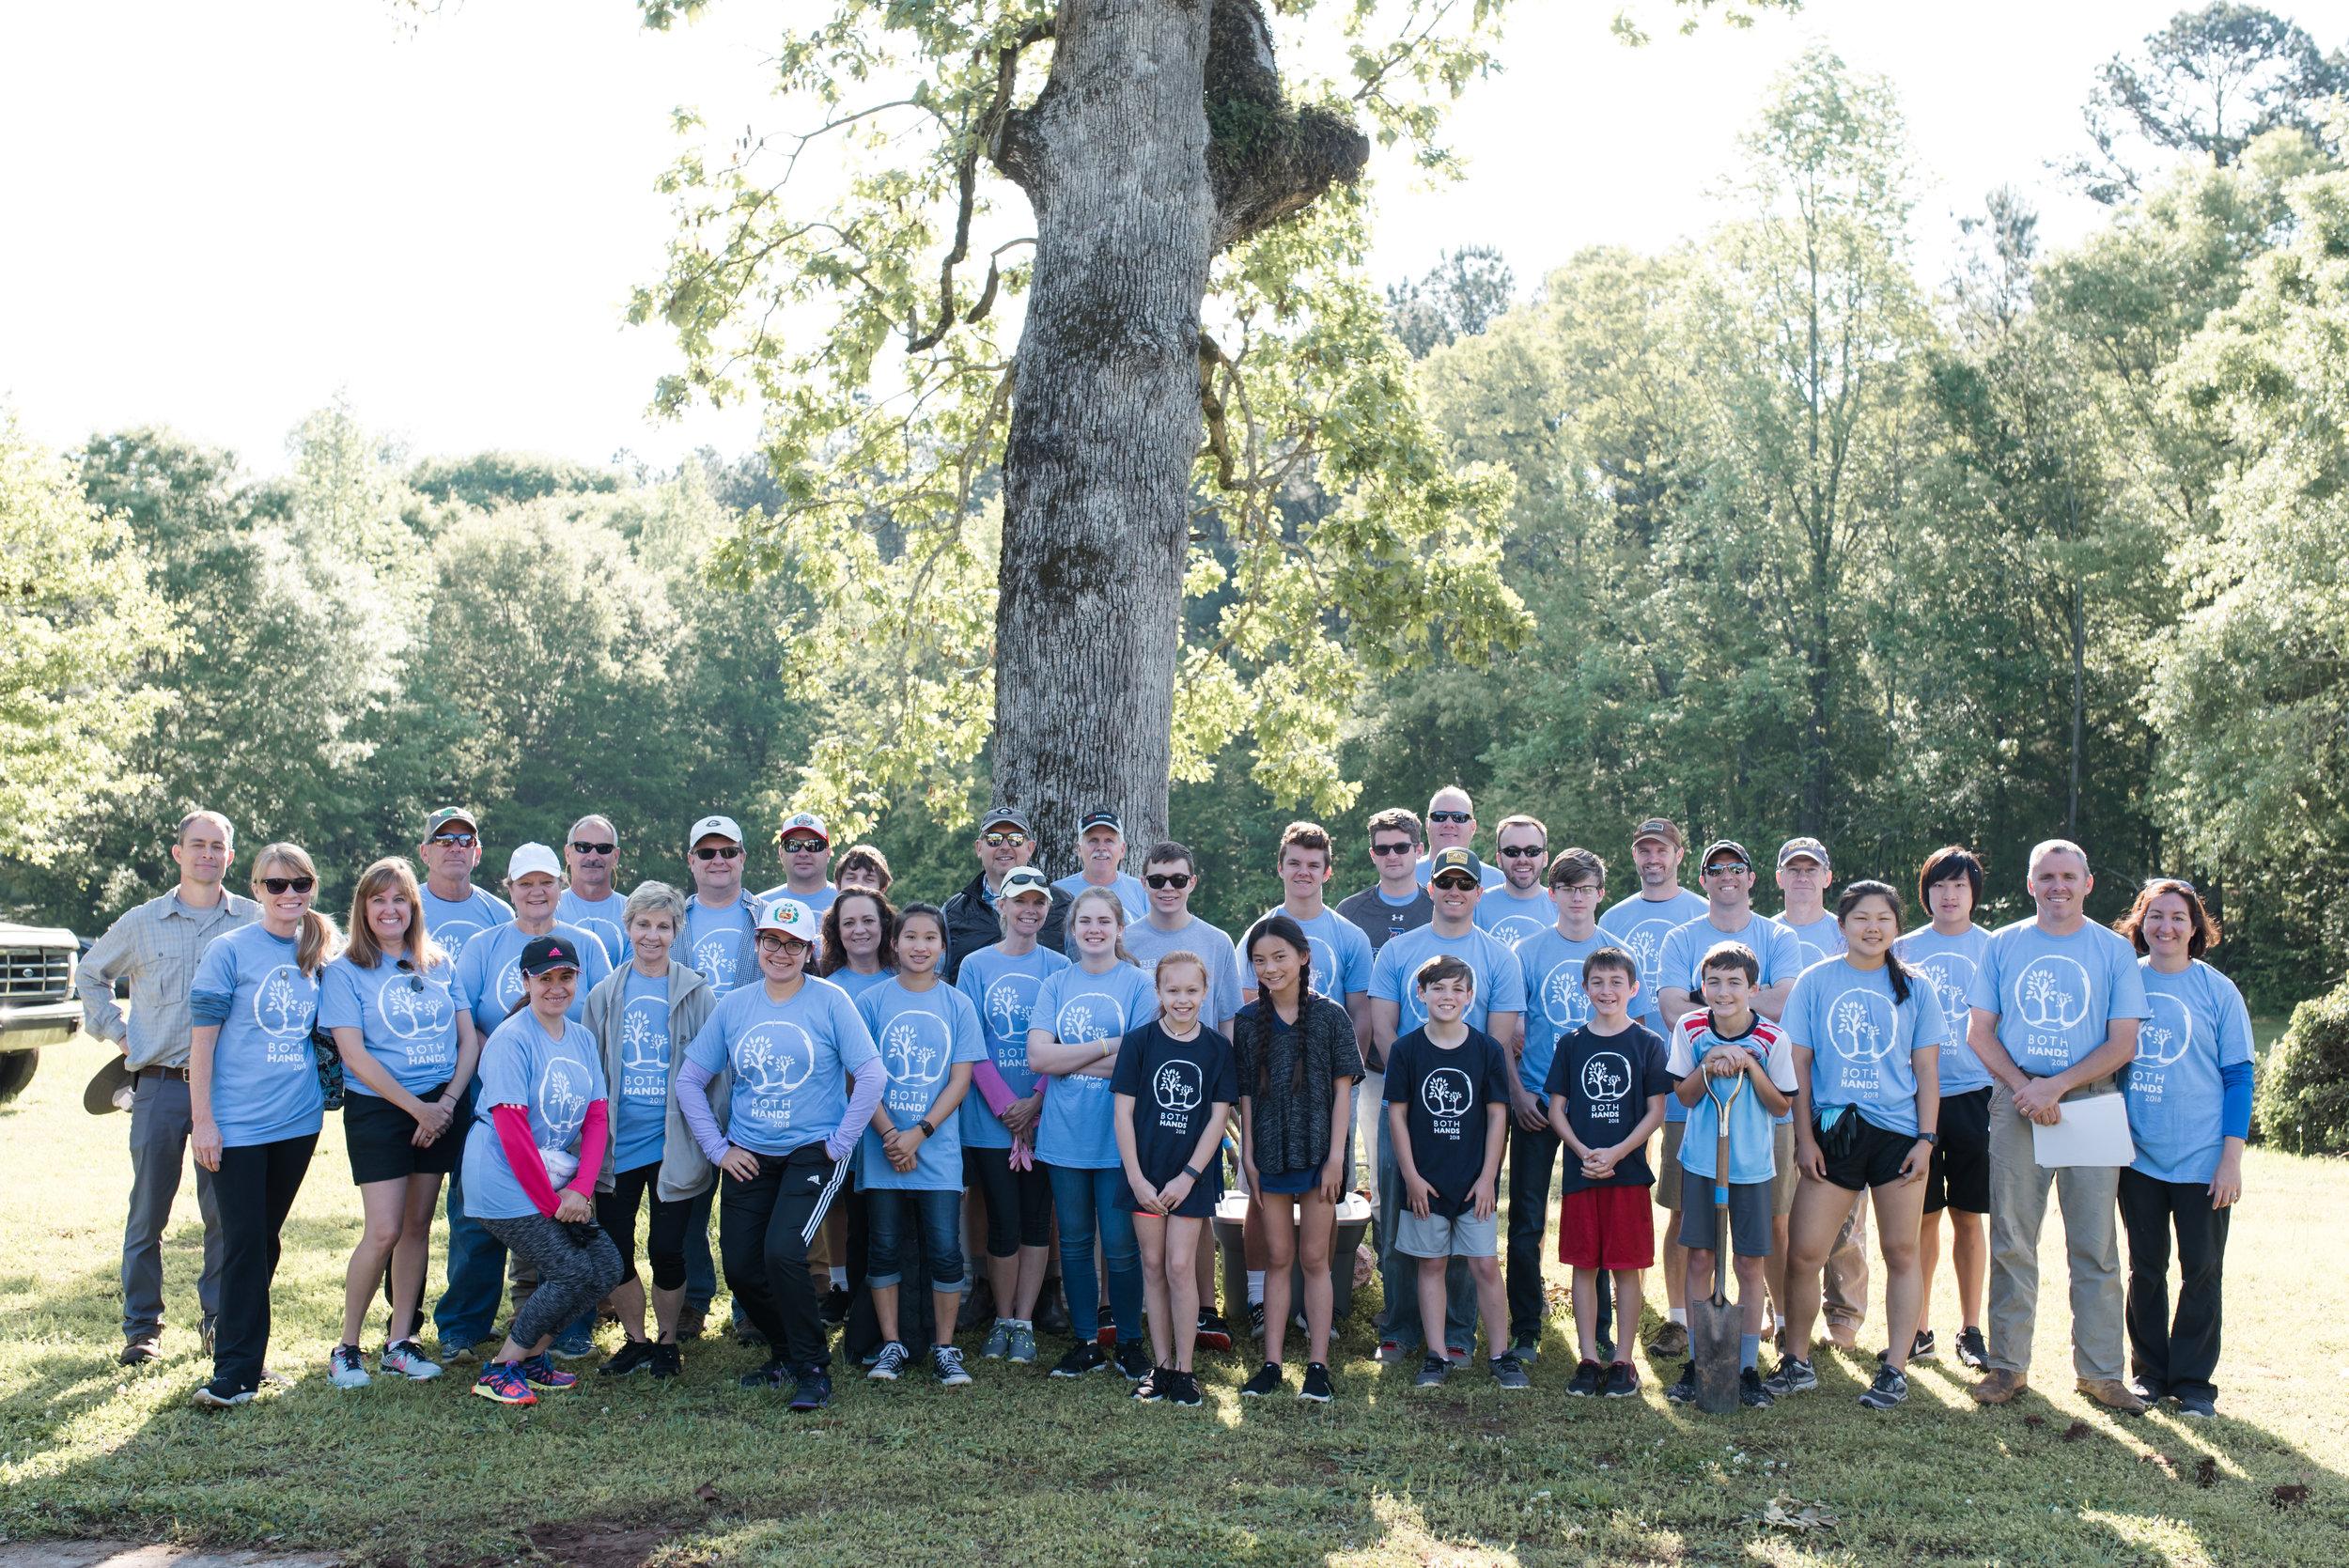 Project Number 4 - Volunteer teams from Redeemer Presbyterian Church and Watkinsville First Baptist Church!